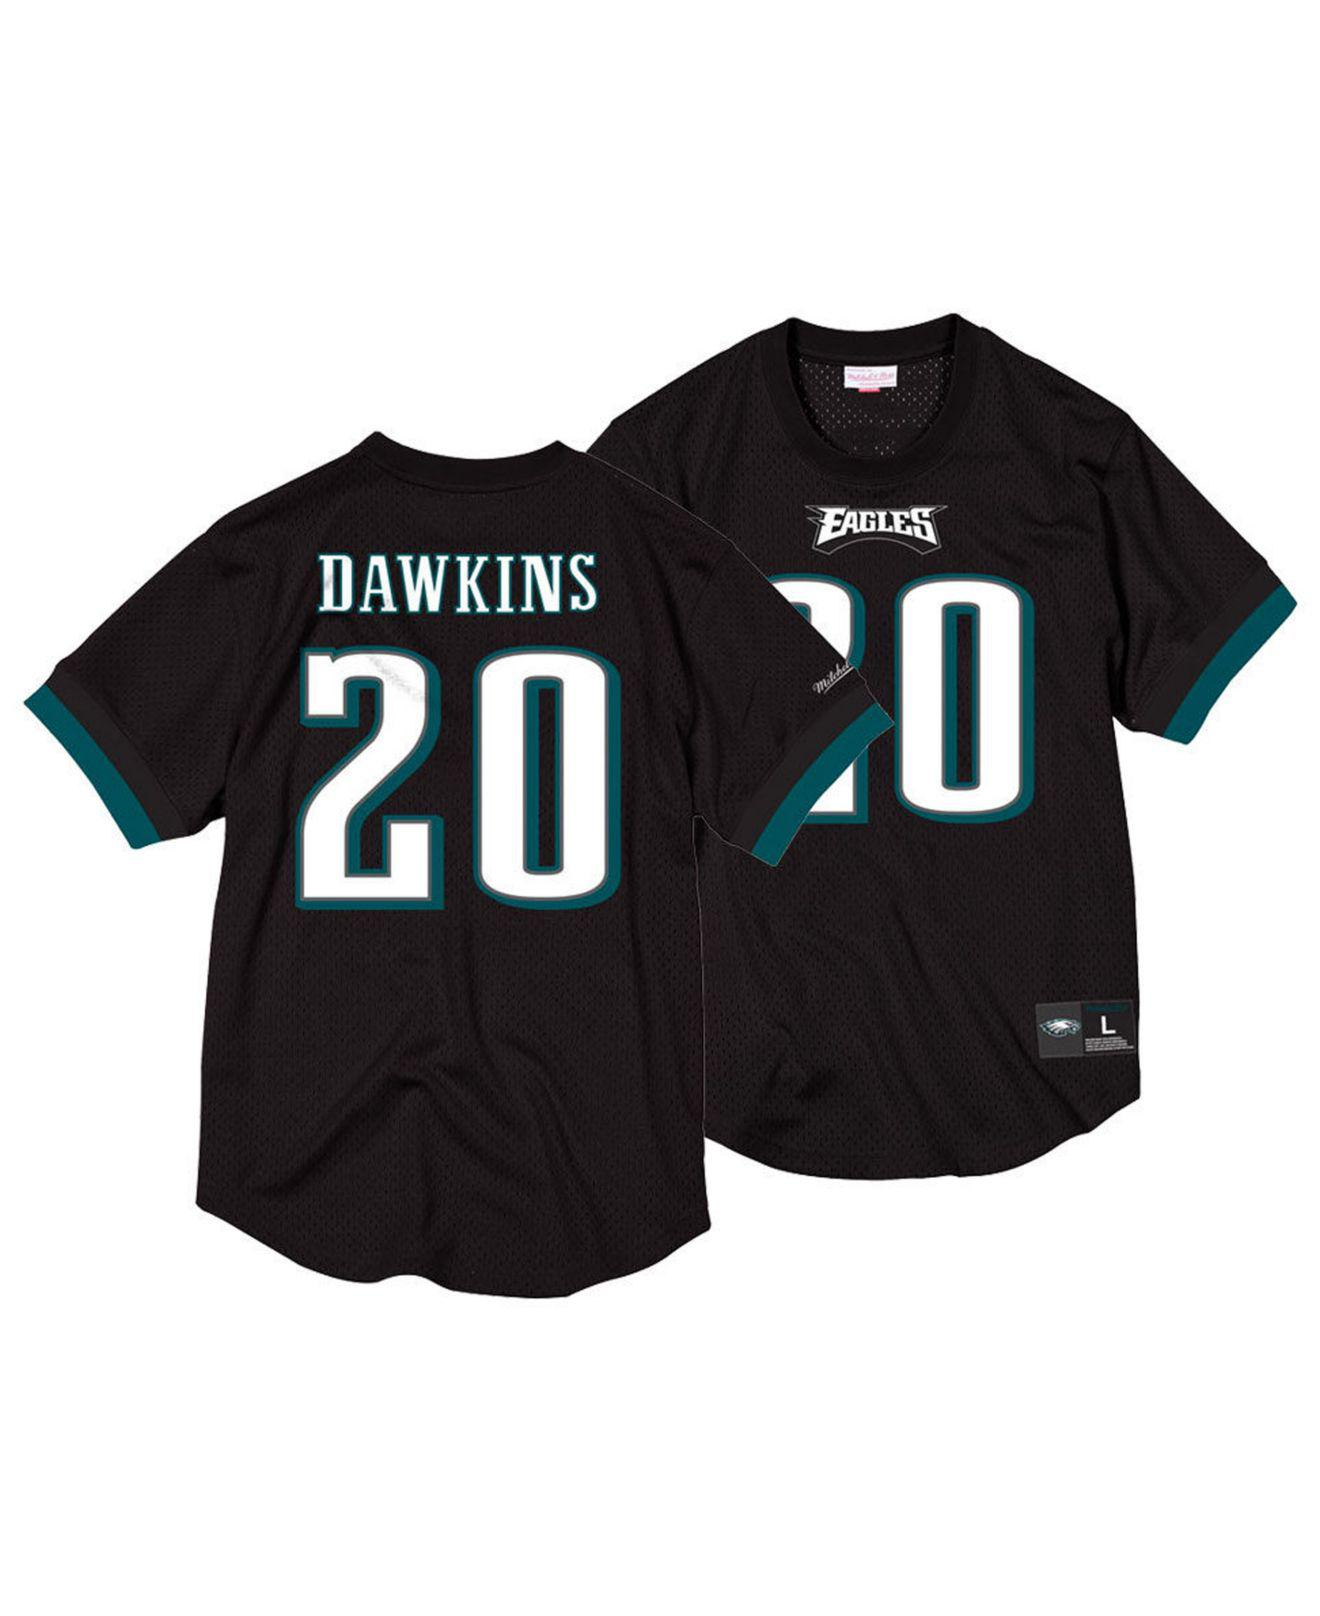 reputable site 4bf88 a0c7b Men's Black Brian Dawkins Philadelphia Eagles Mesh Name And Number Crewneck  Jersey